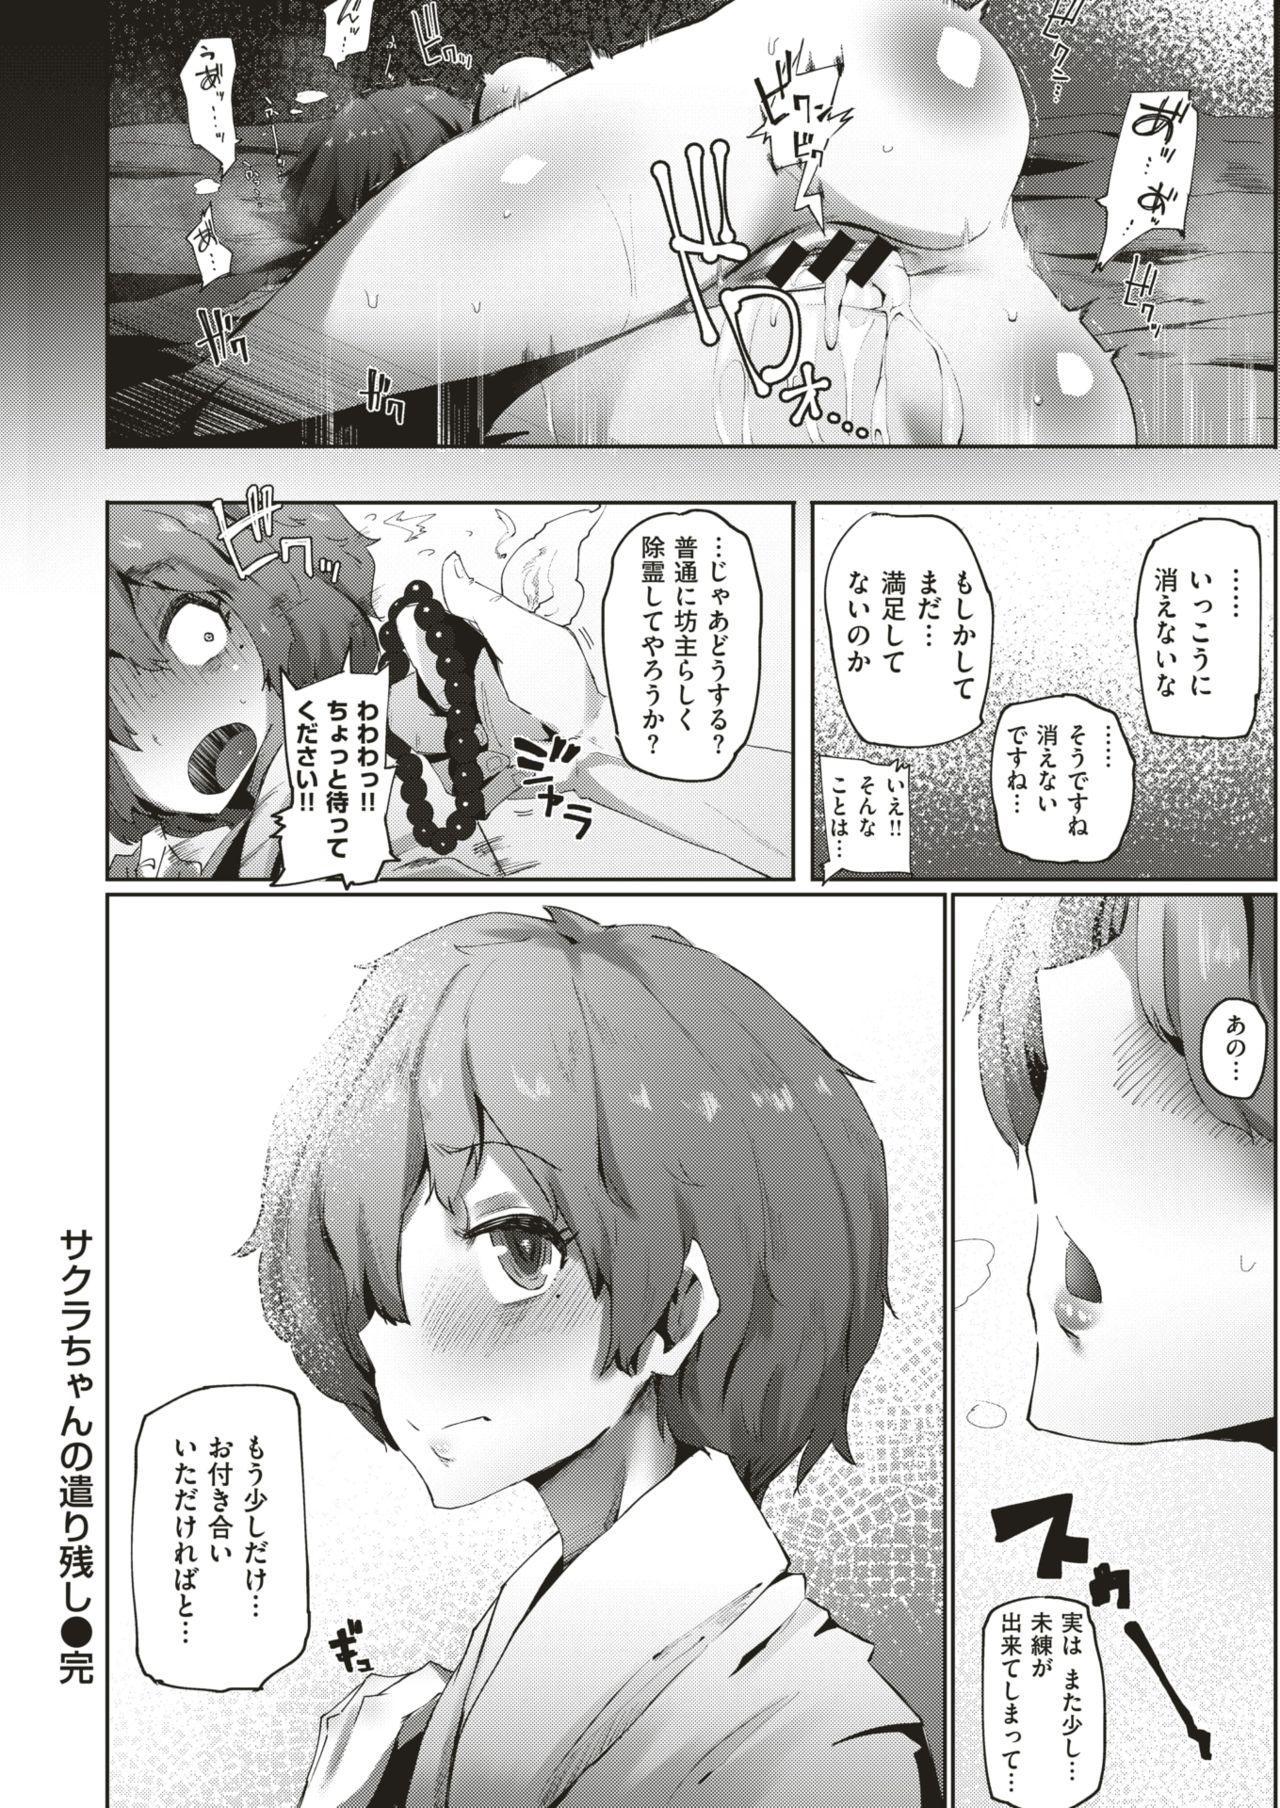 COMIC HAPPINING Vol. 4 146